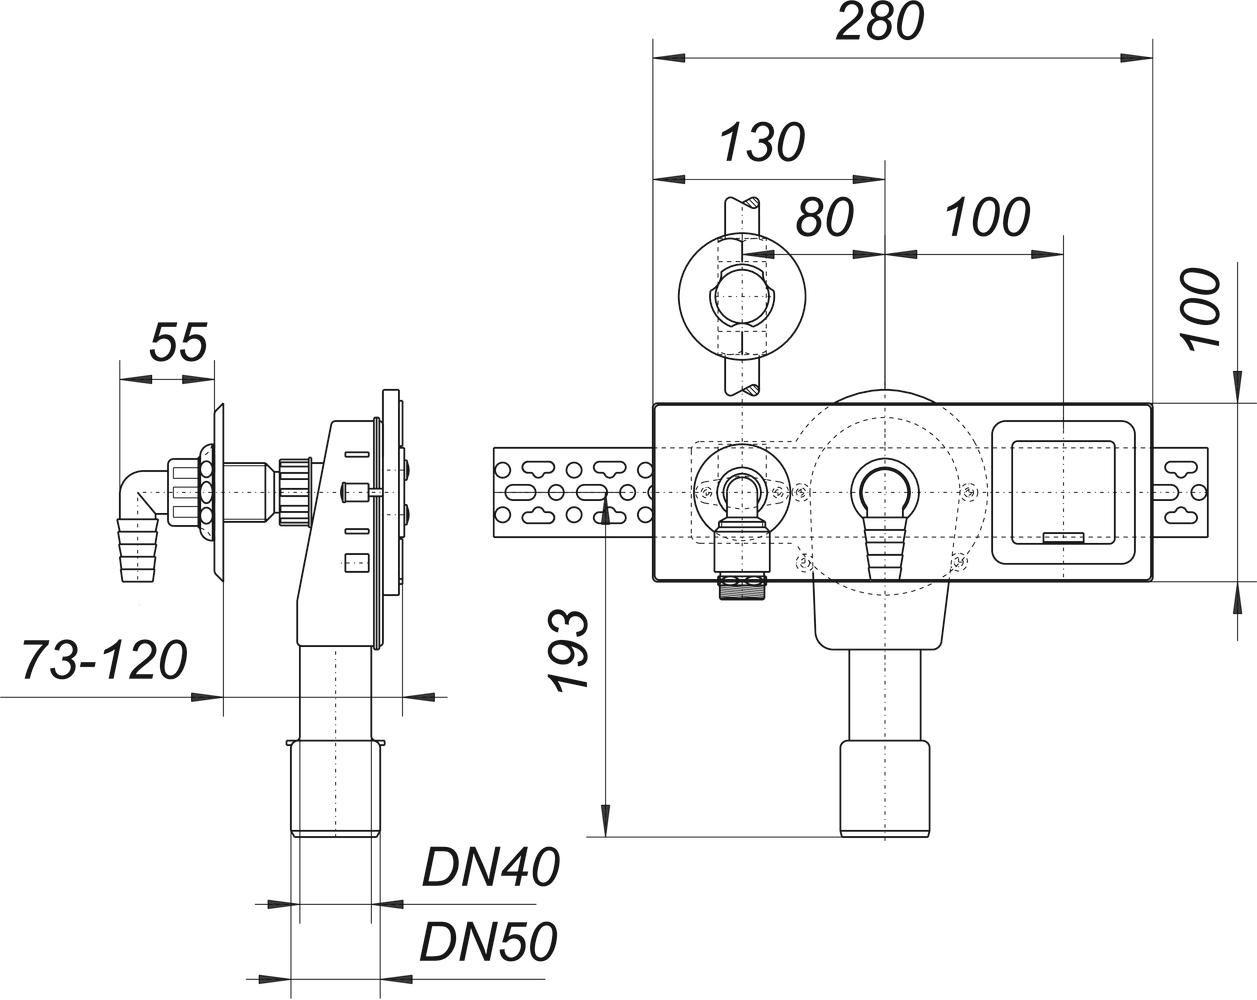 washing machine or dishwasher trap type 405 E, DN 40/DN 50